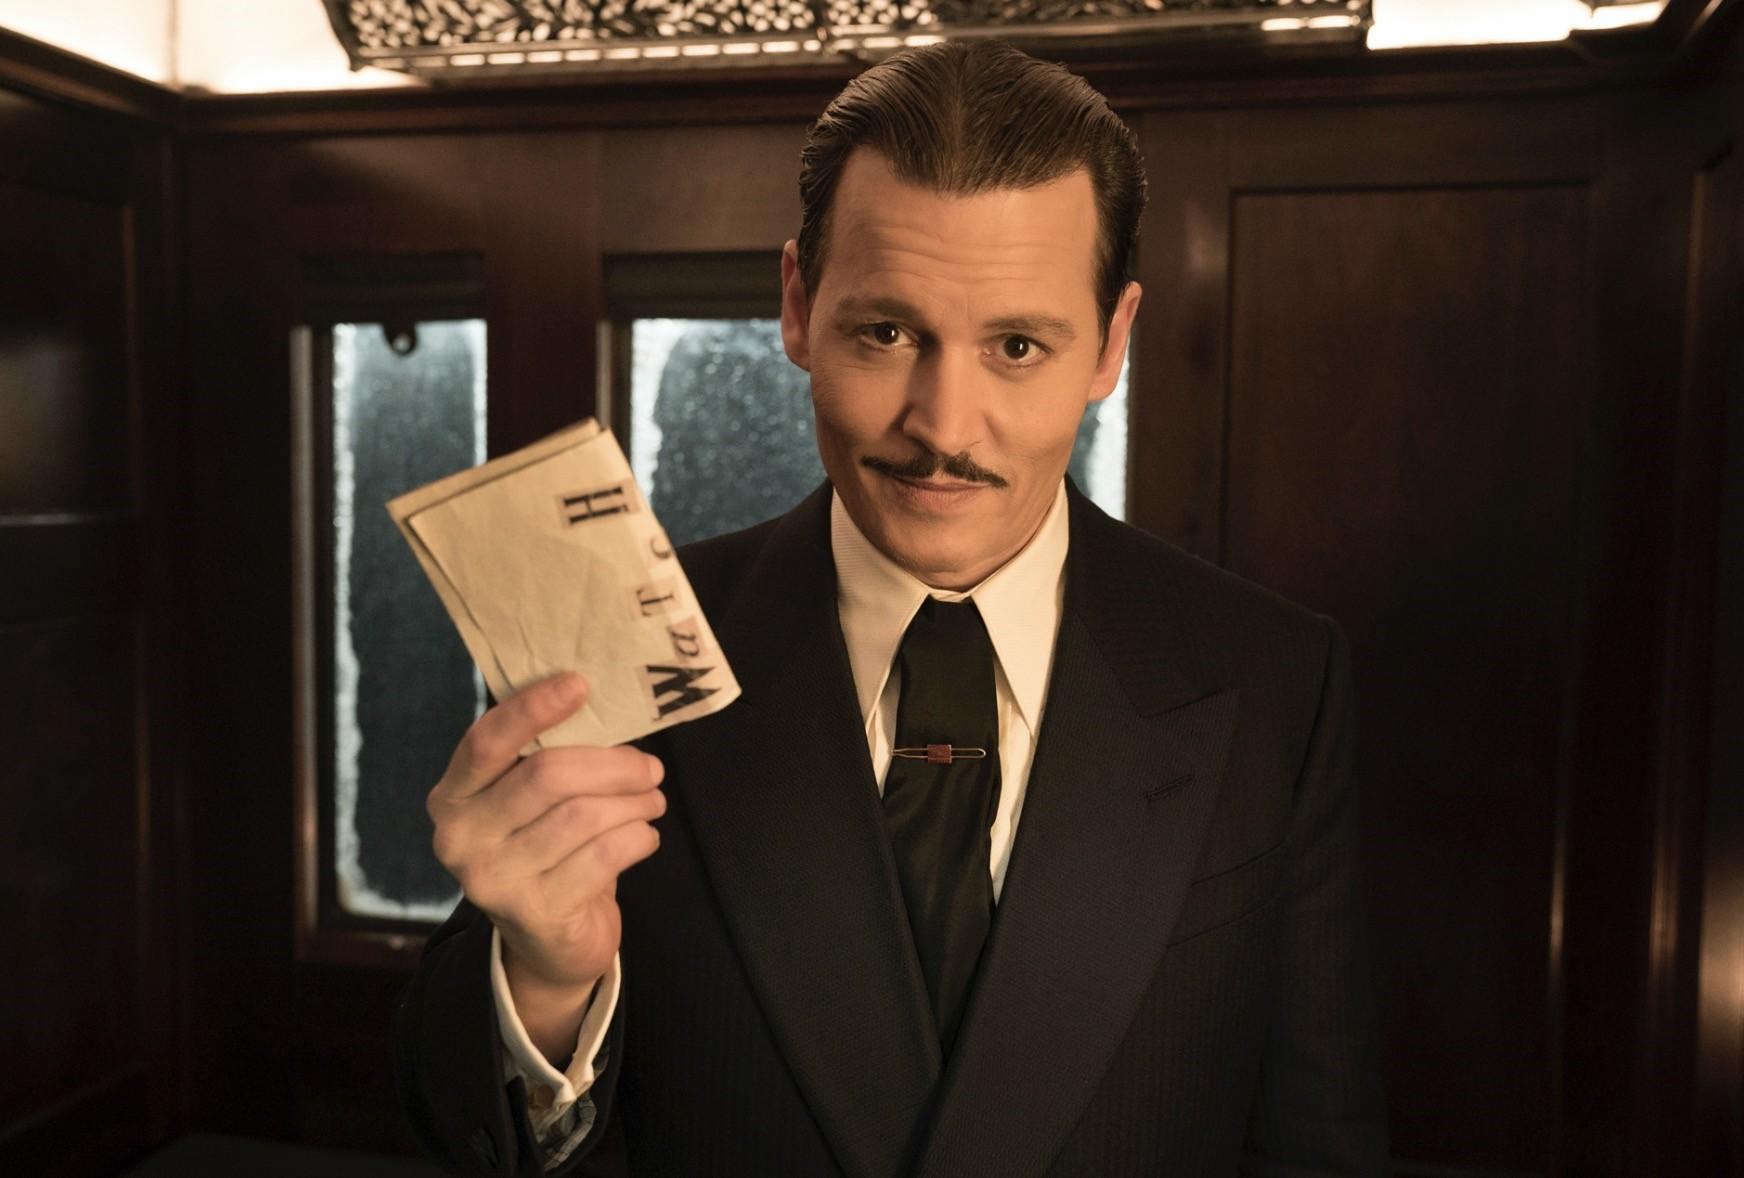 Johhny Depp stars as Mr. Ratchet, the murder victim in the story.